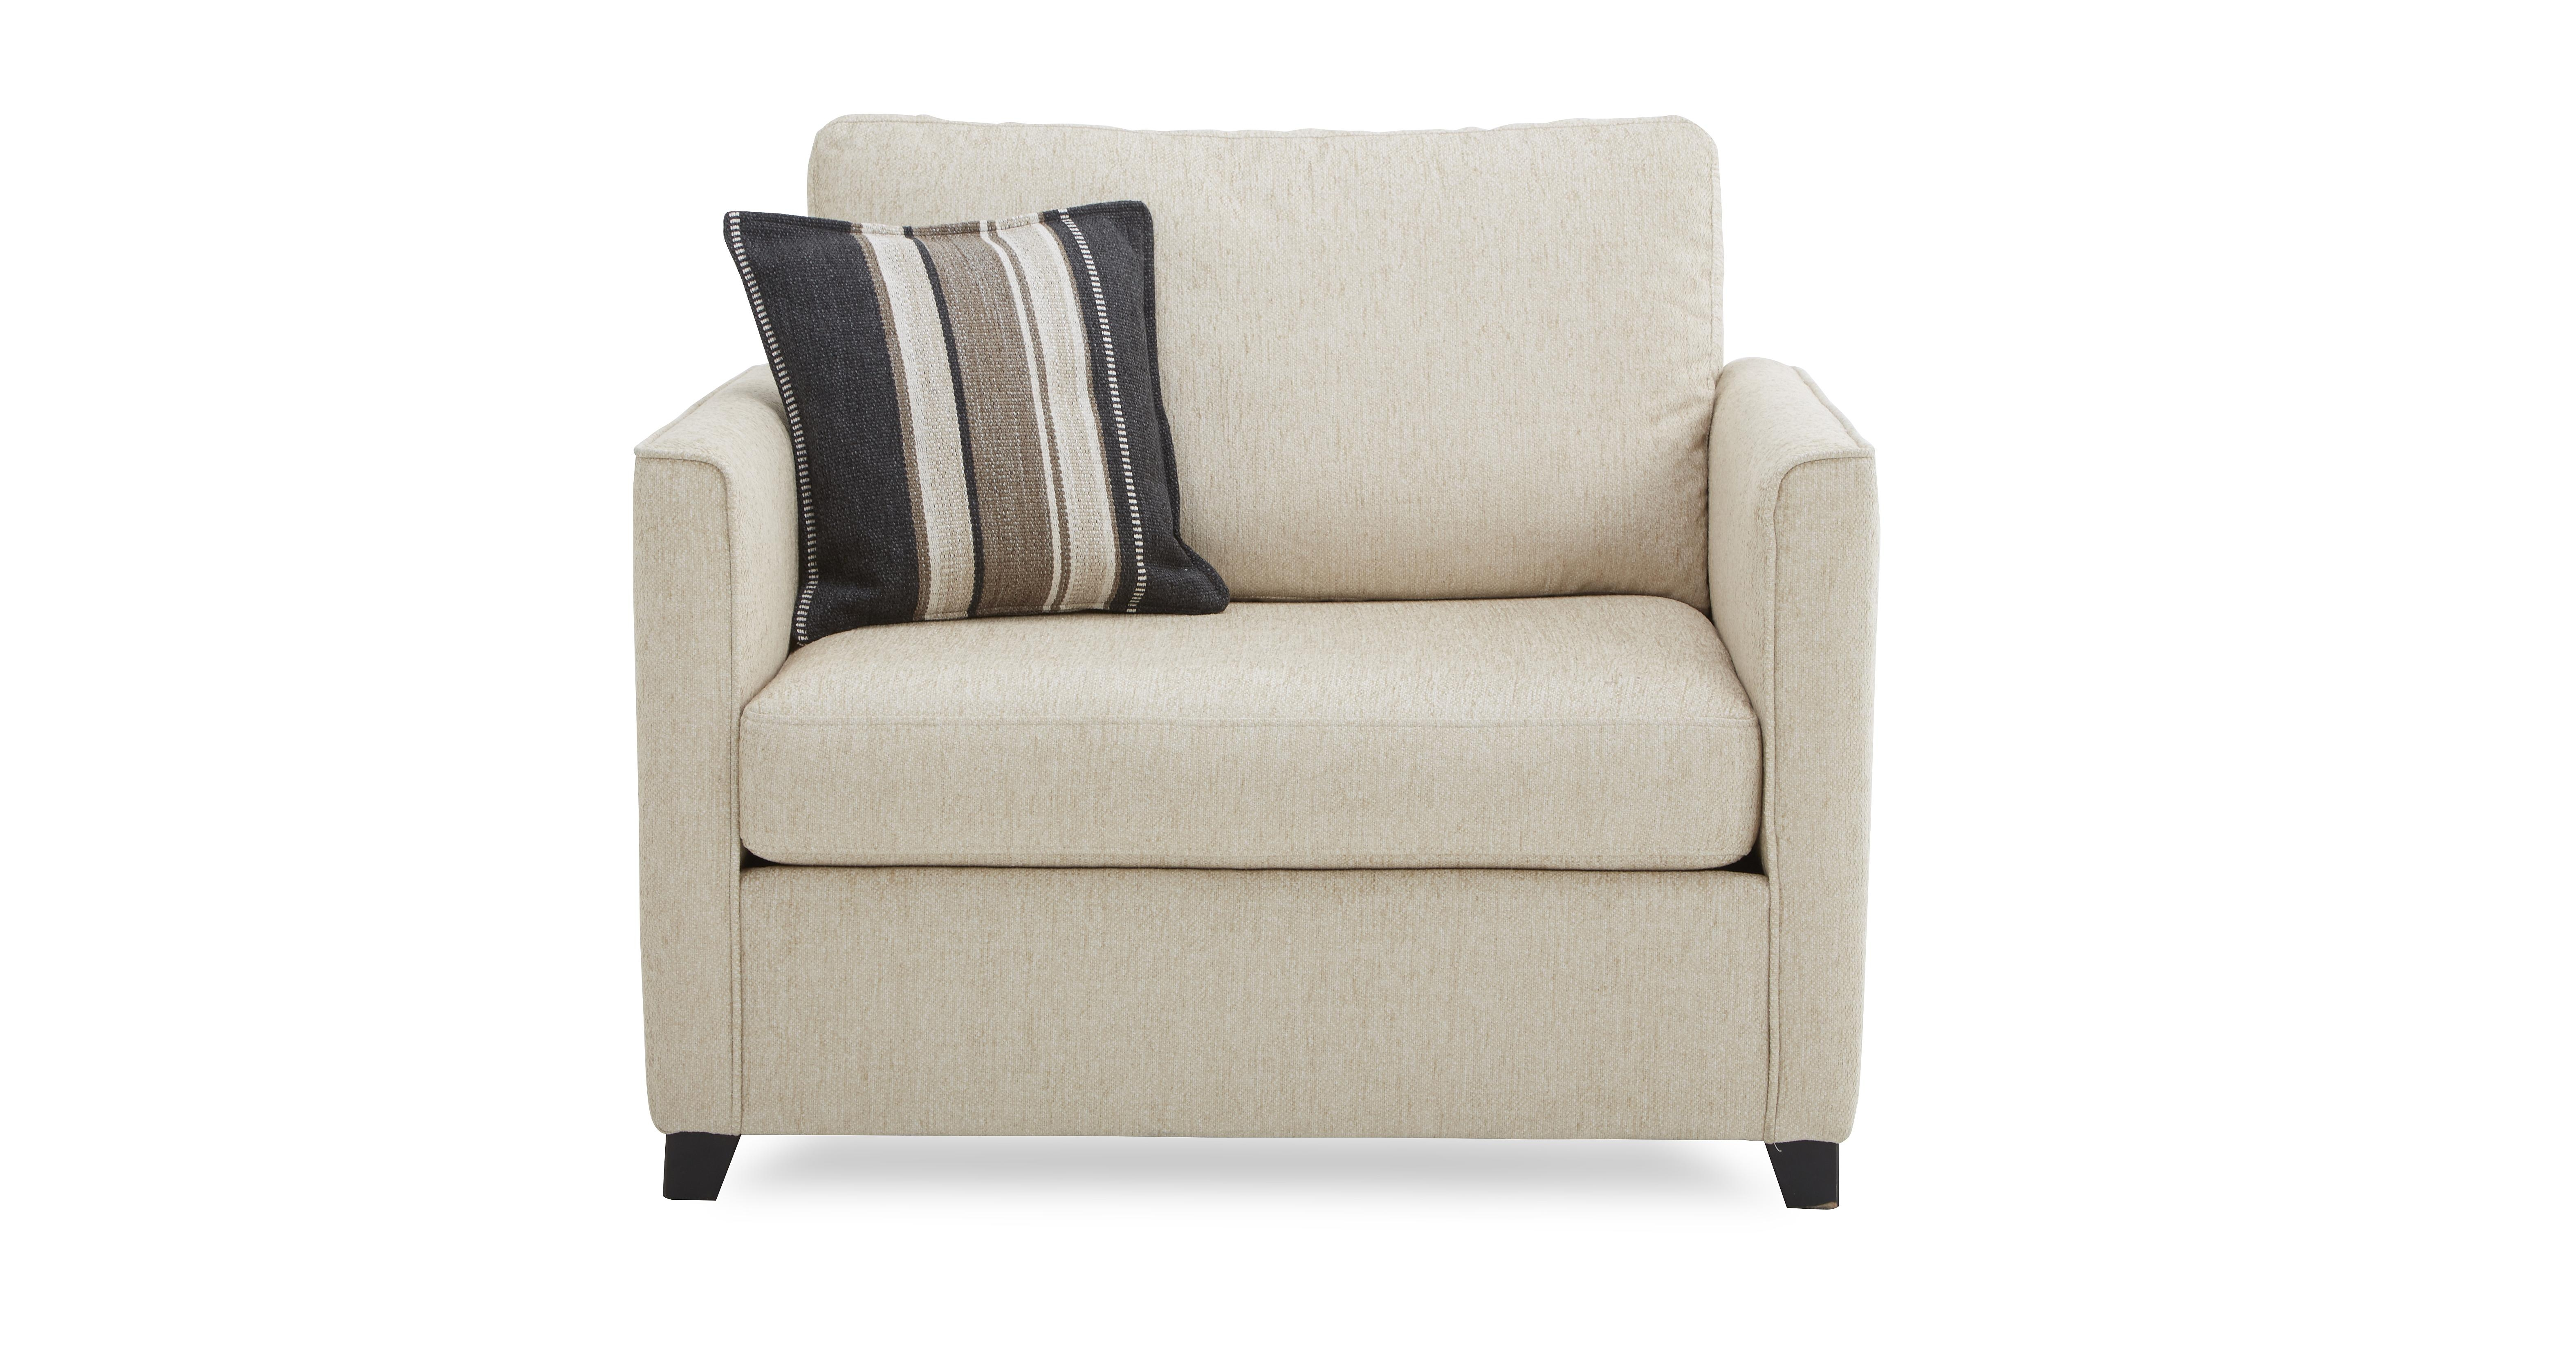 Chair Sofa Bed Armchair Single Sofa Bed Chair Uk Armchair Hong Regarding Sofa Bed Chairs (Image 7 of 15)